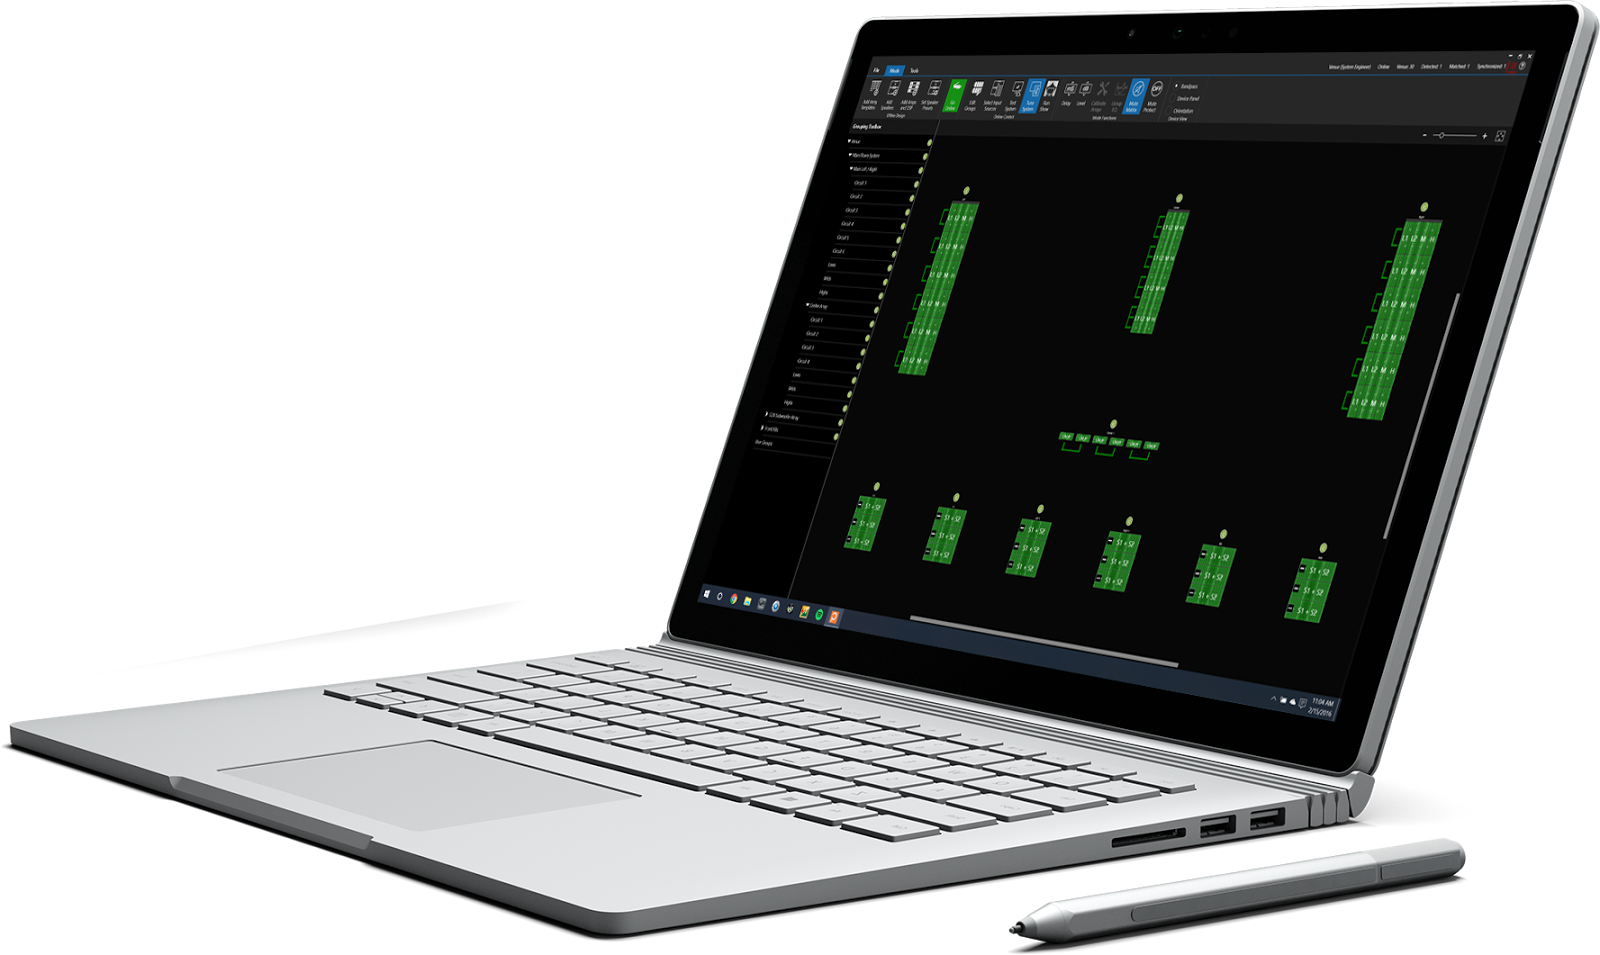 JBL Professional by HARMAN Introduces HiQnet Performance